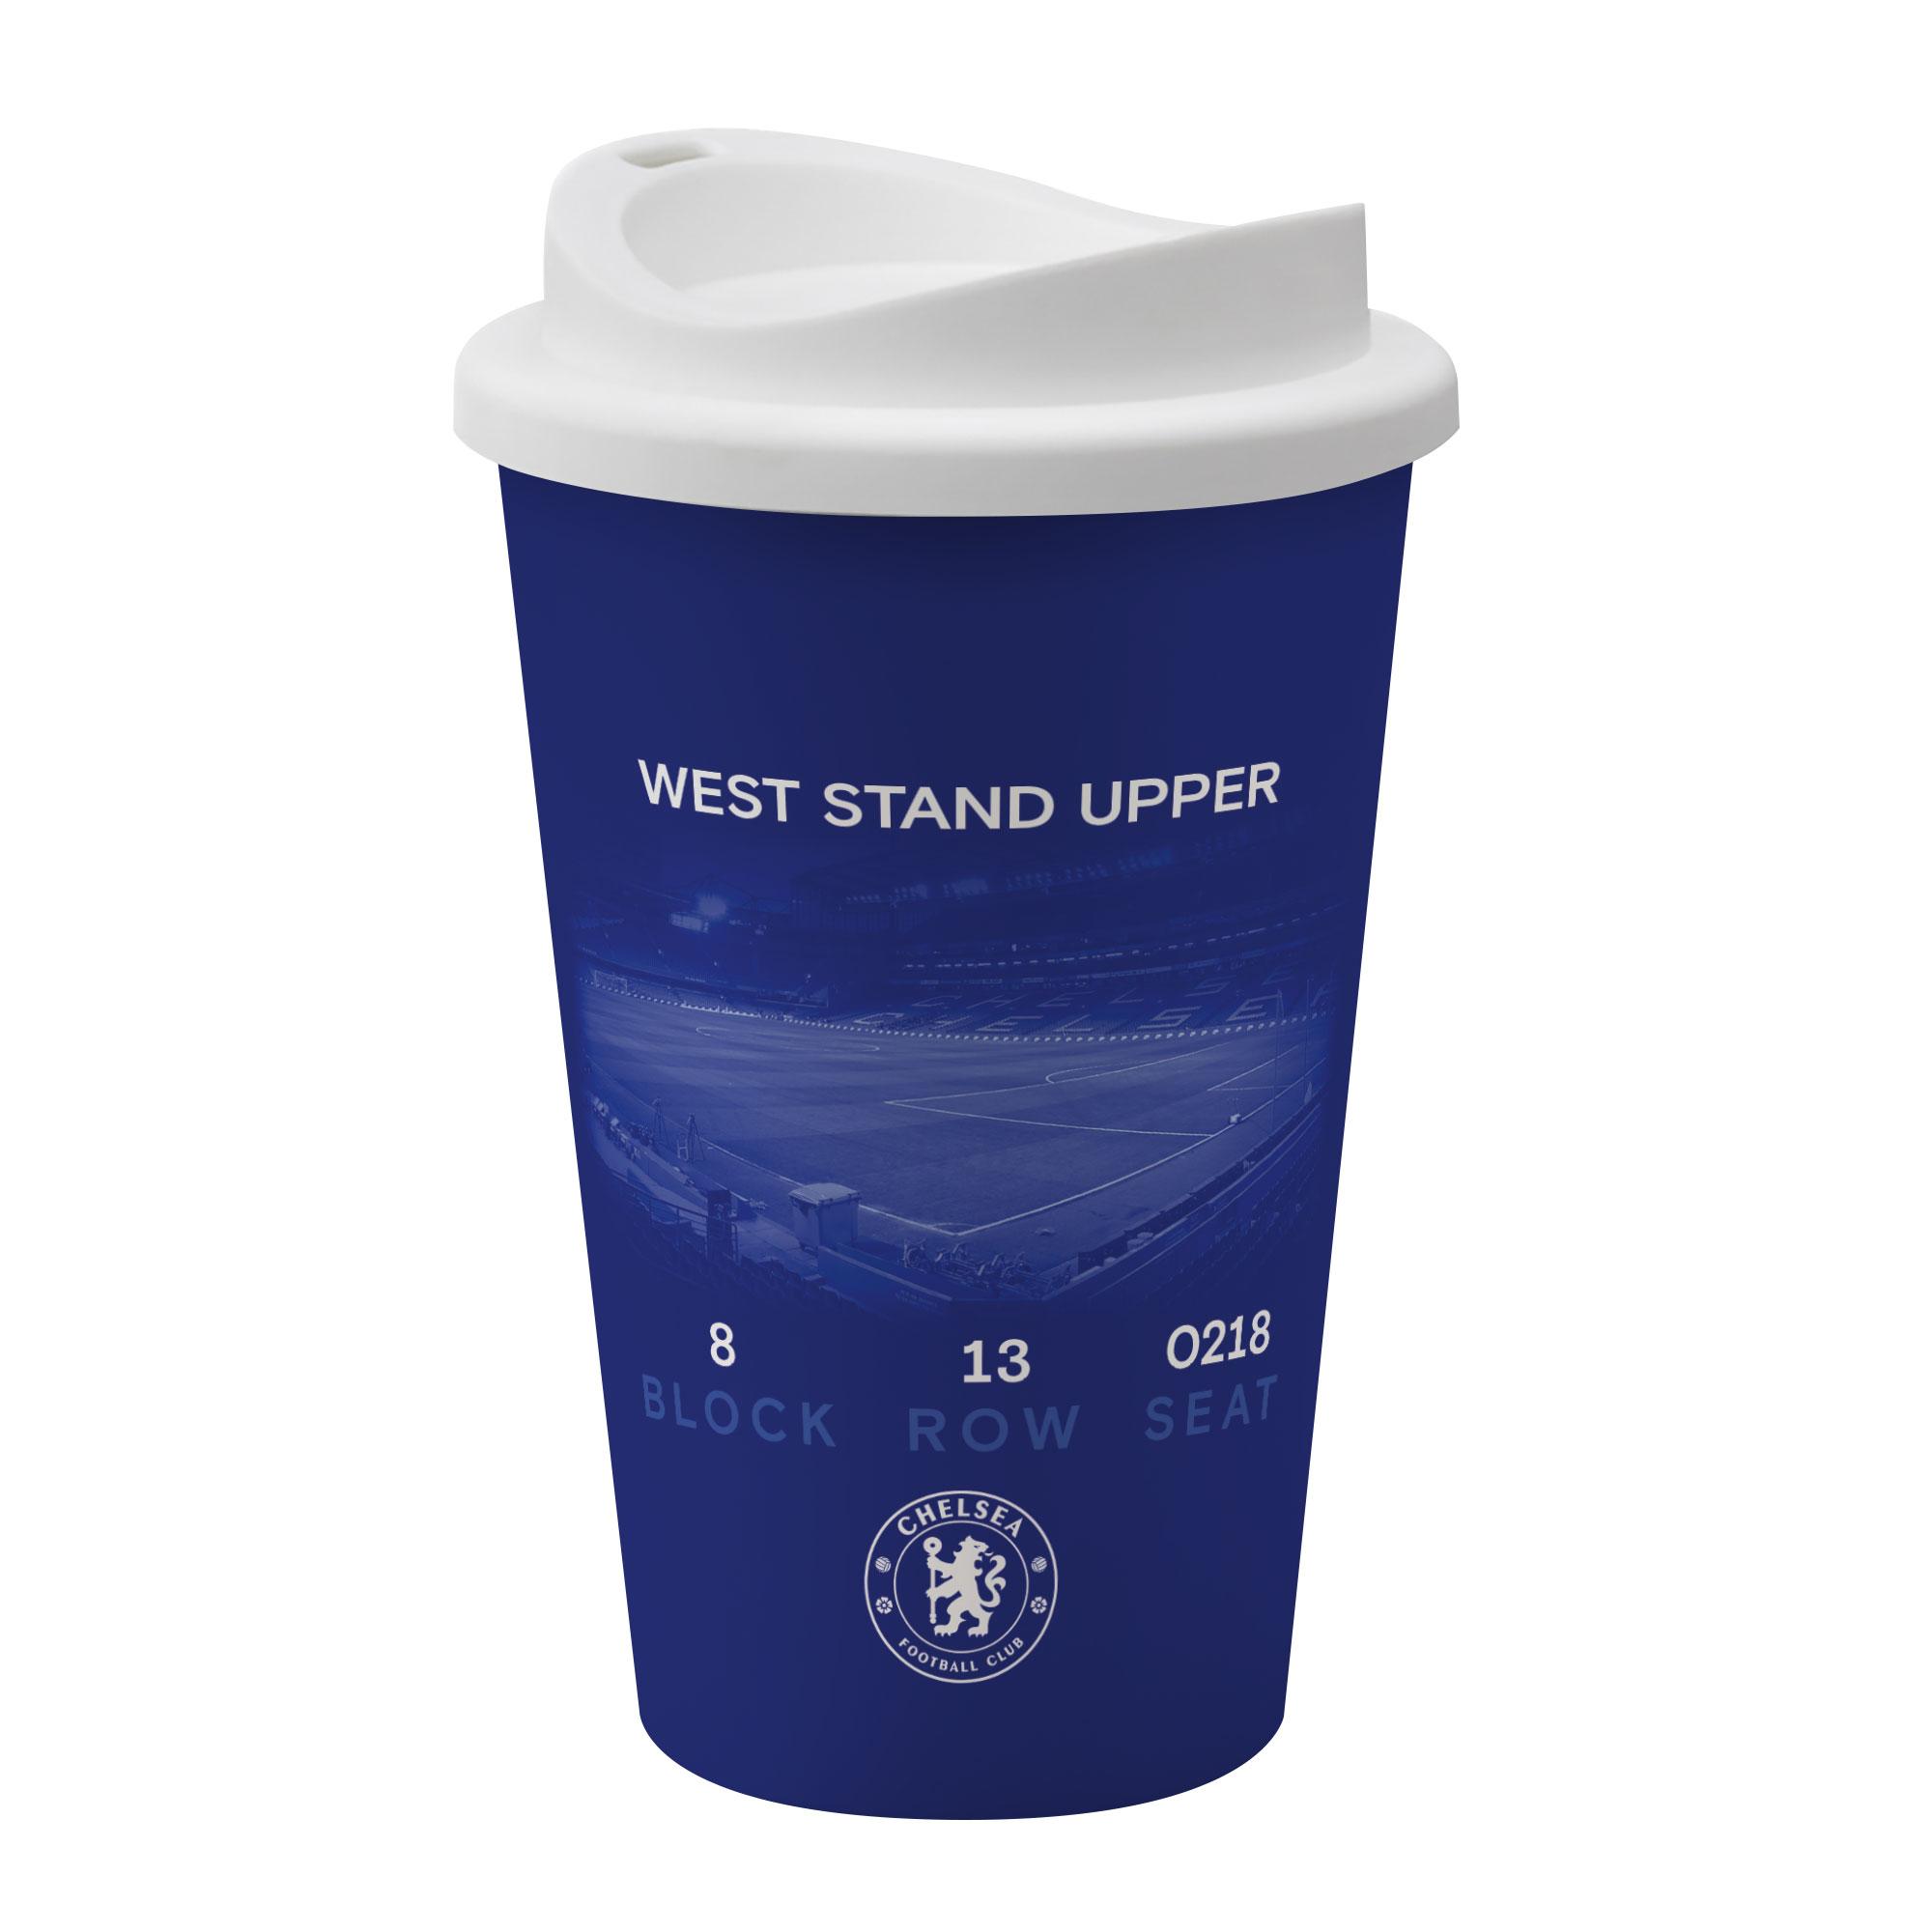 Chelsea FC My Seat in Stamford Bridge Reusable Cup